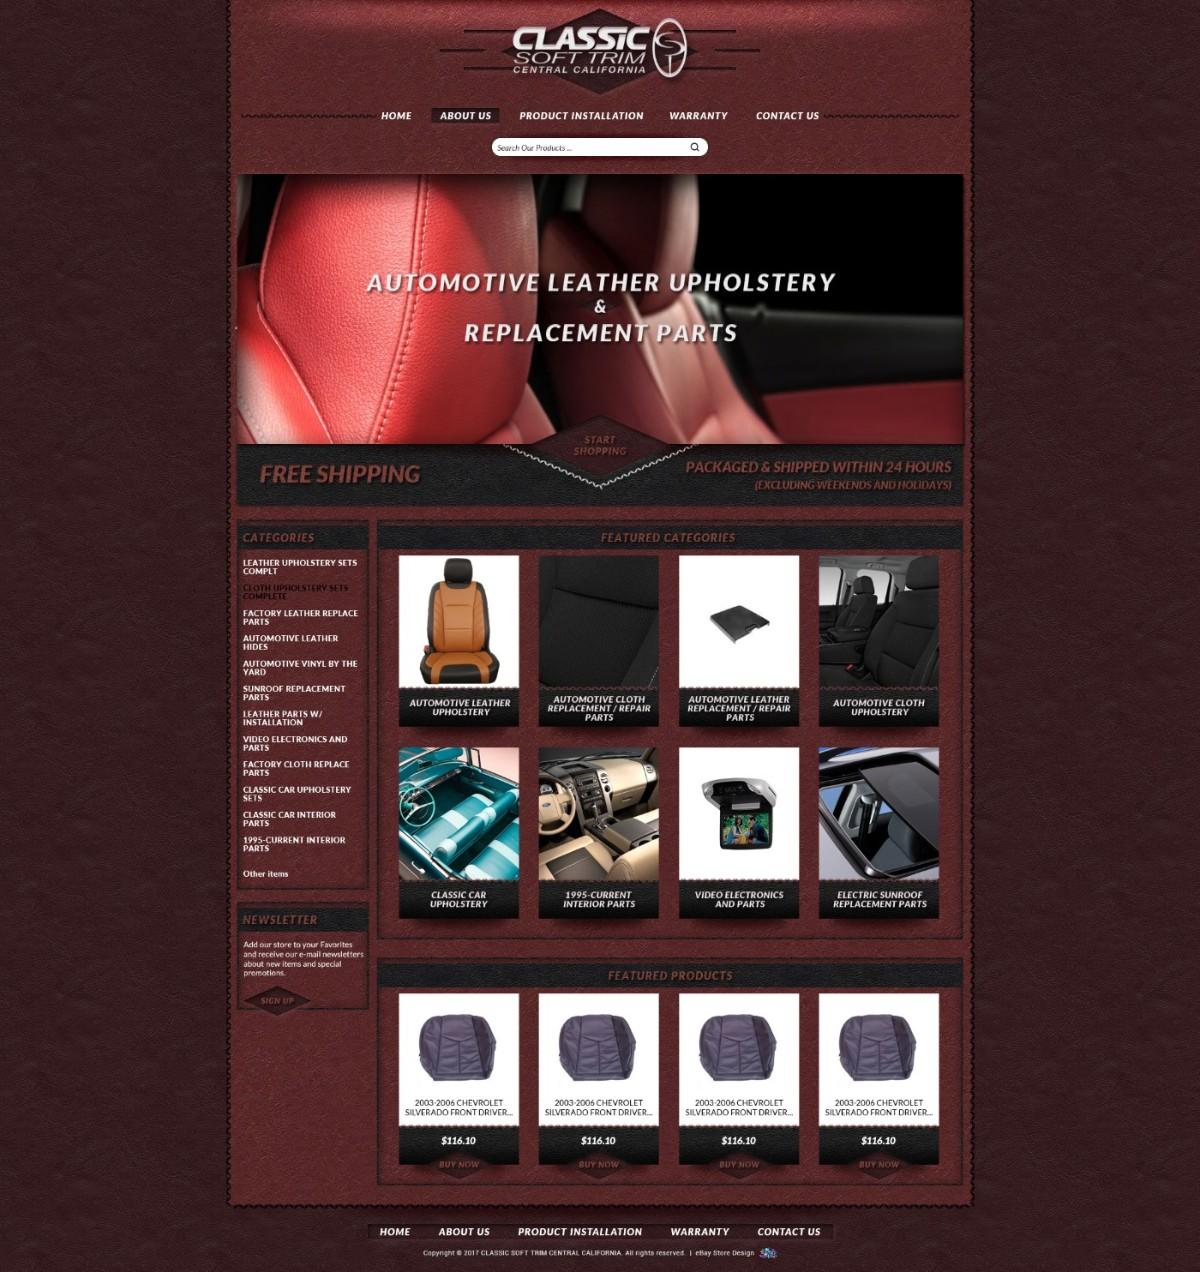 ClassicSoftTrim ebay store v5